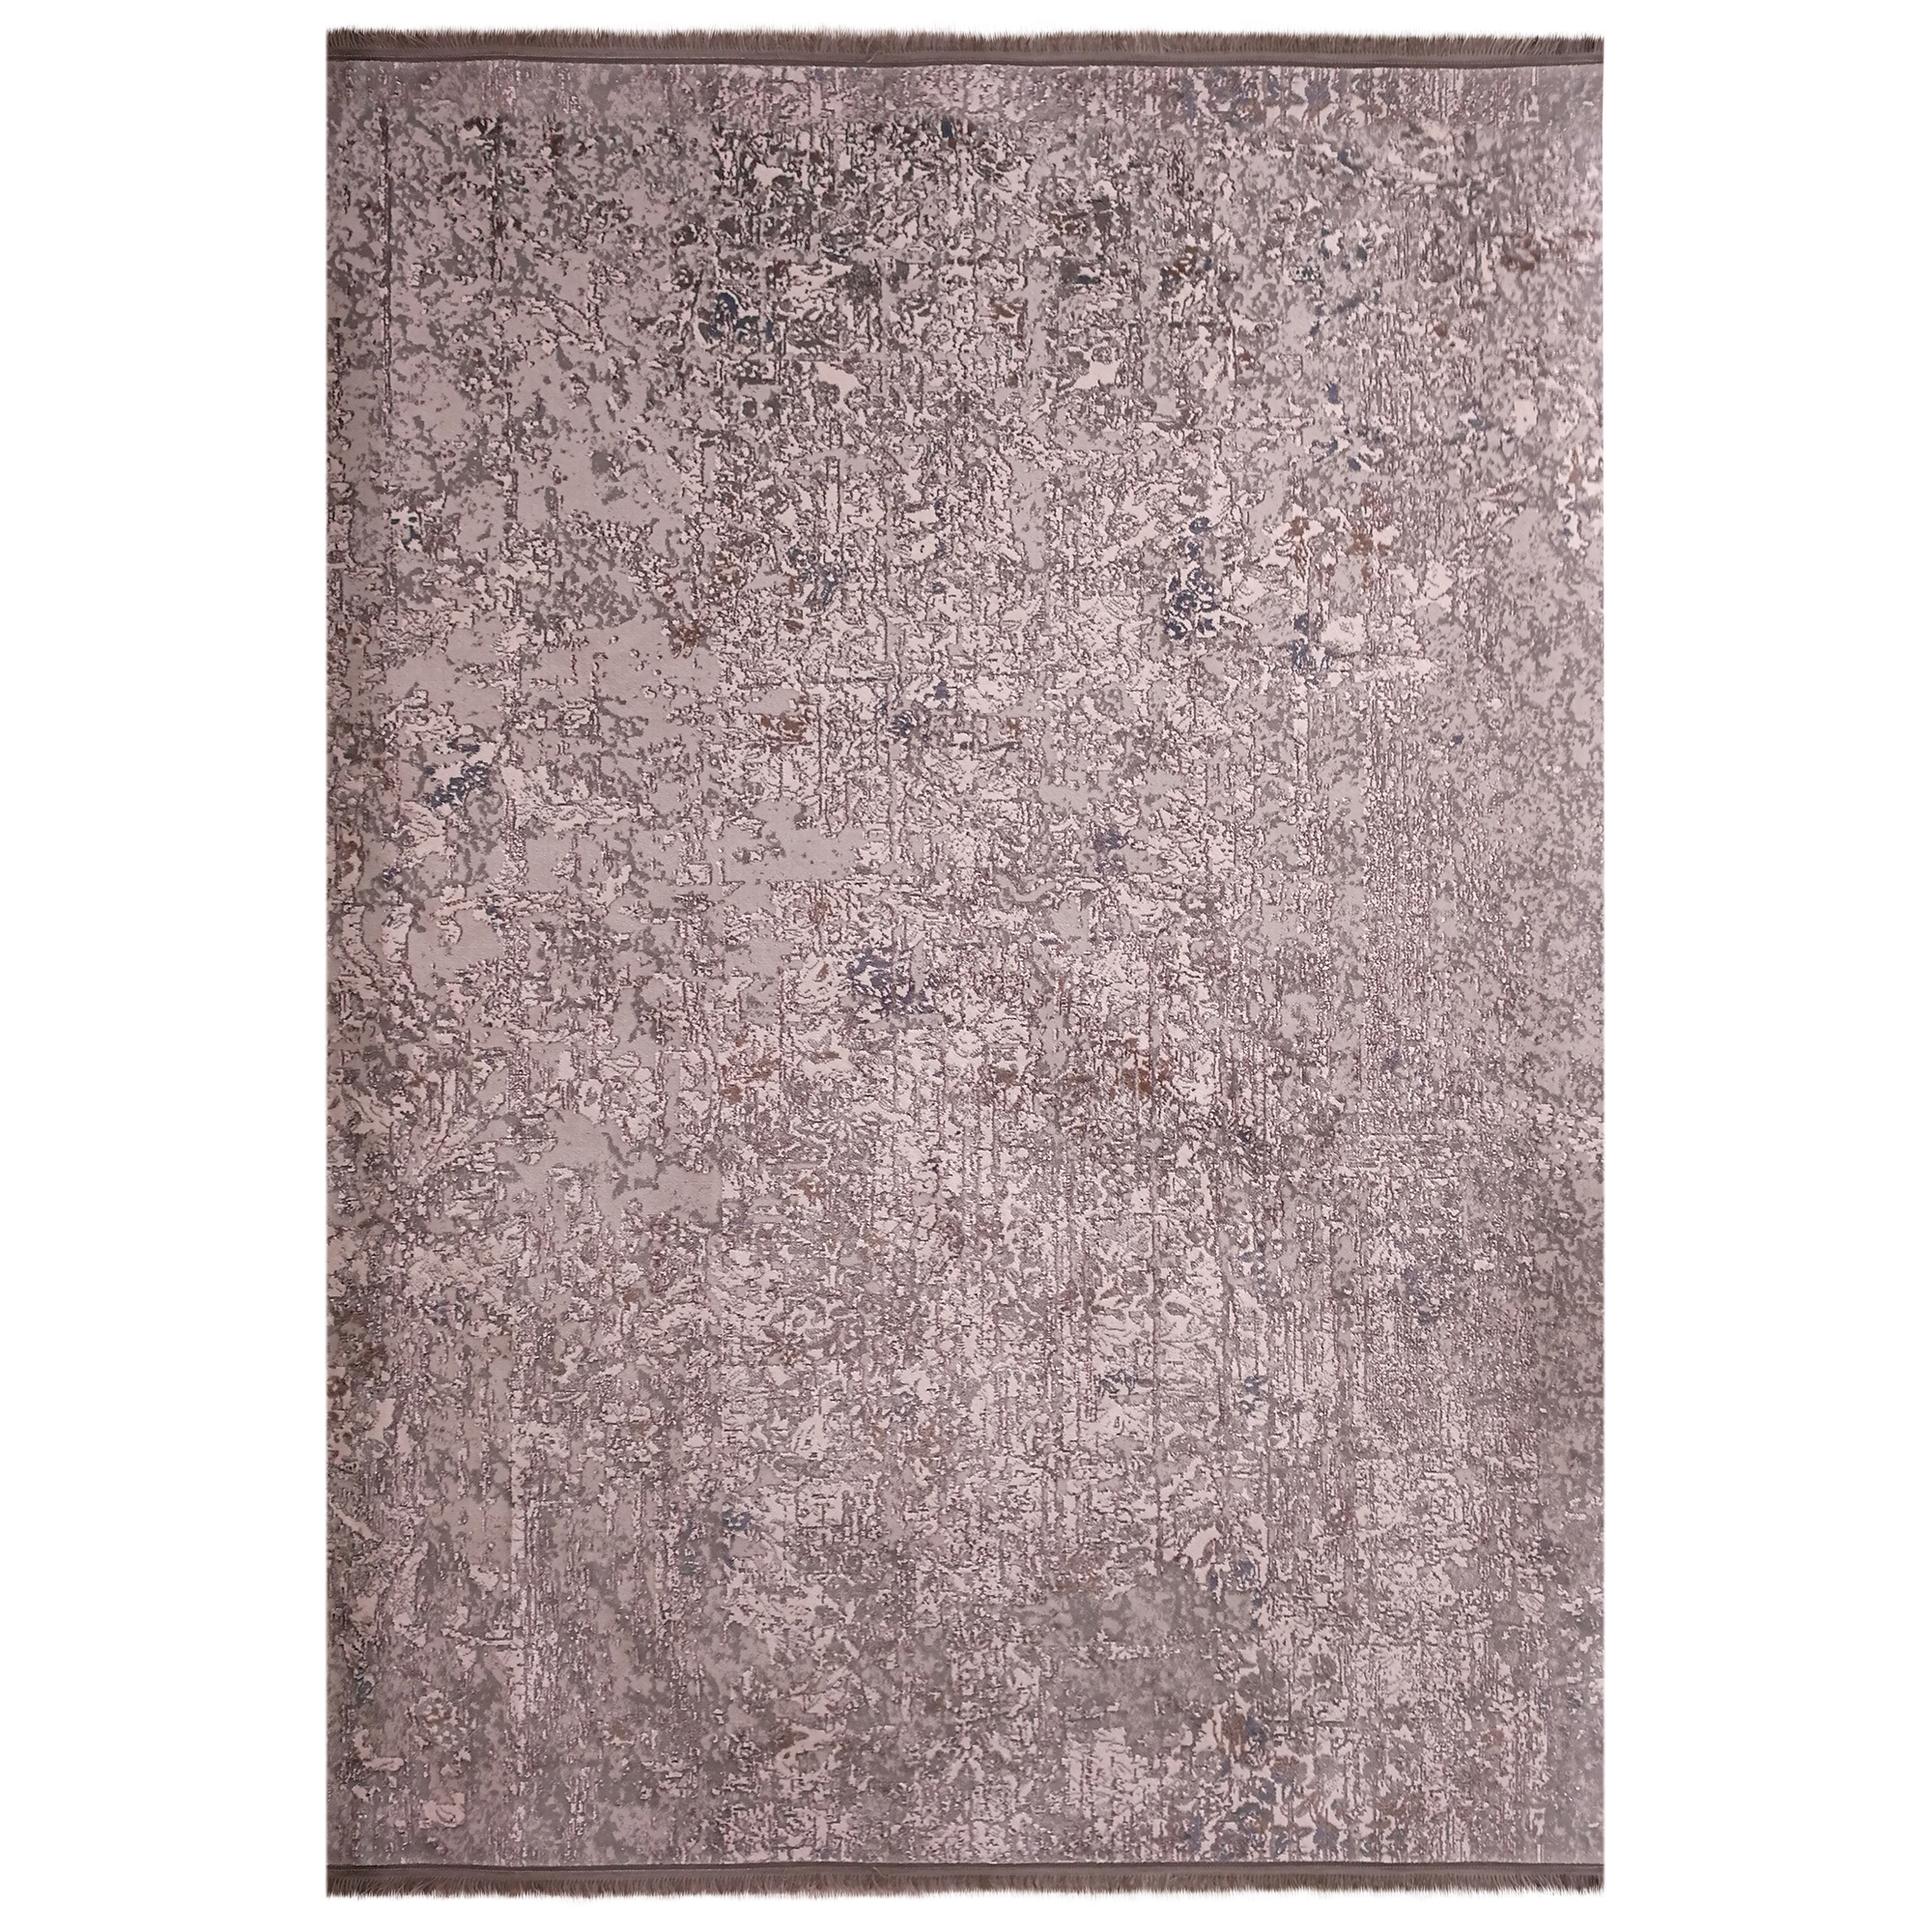 فرش ماشینی زمرد مشهد طرح پتینه کد TA118 زمینه طوسی